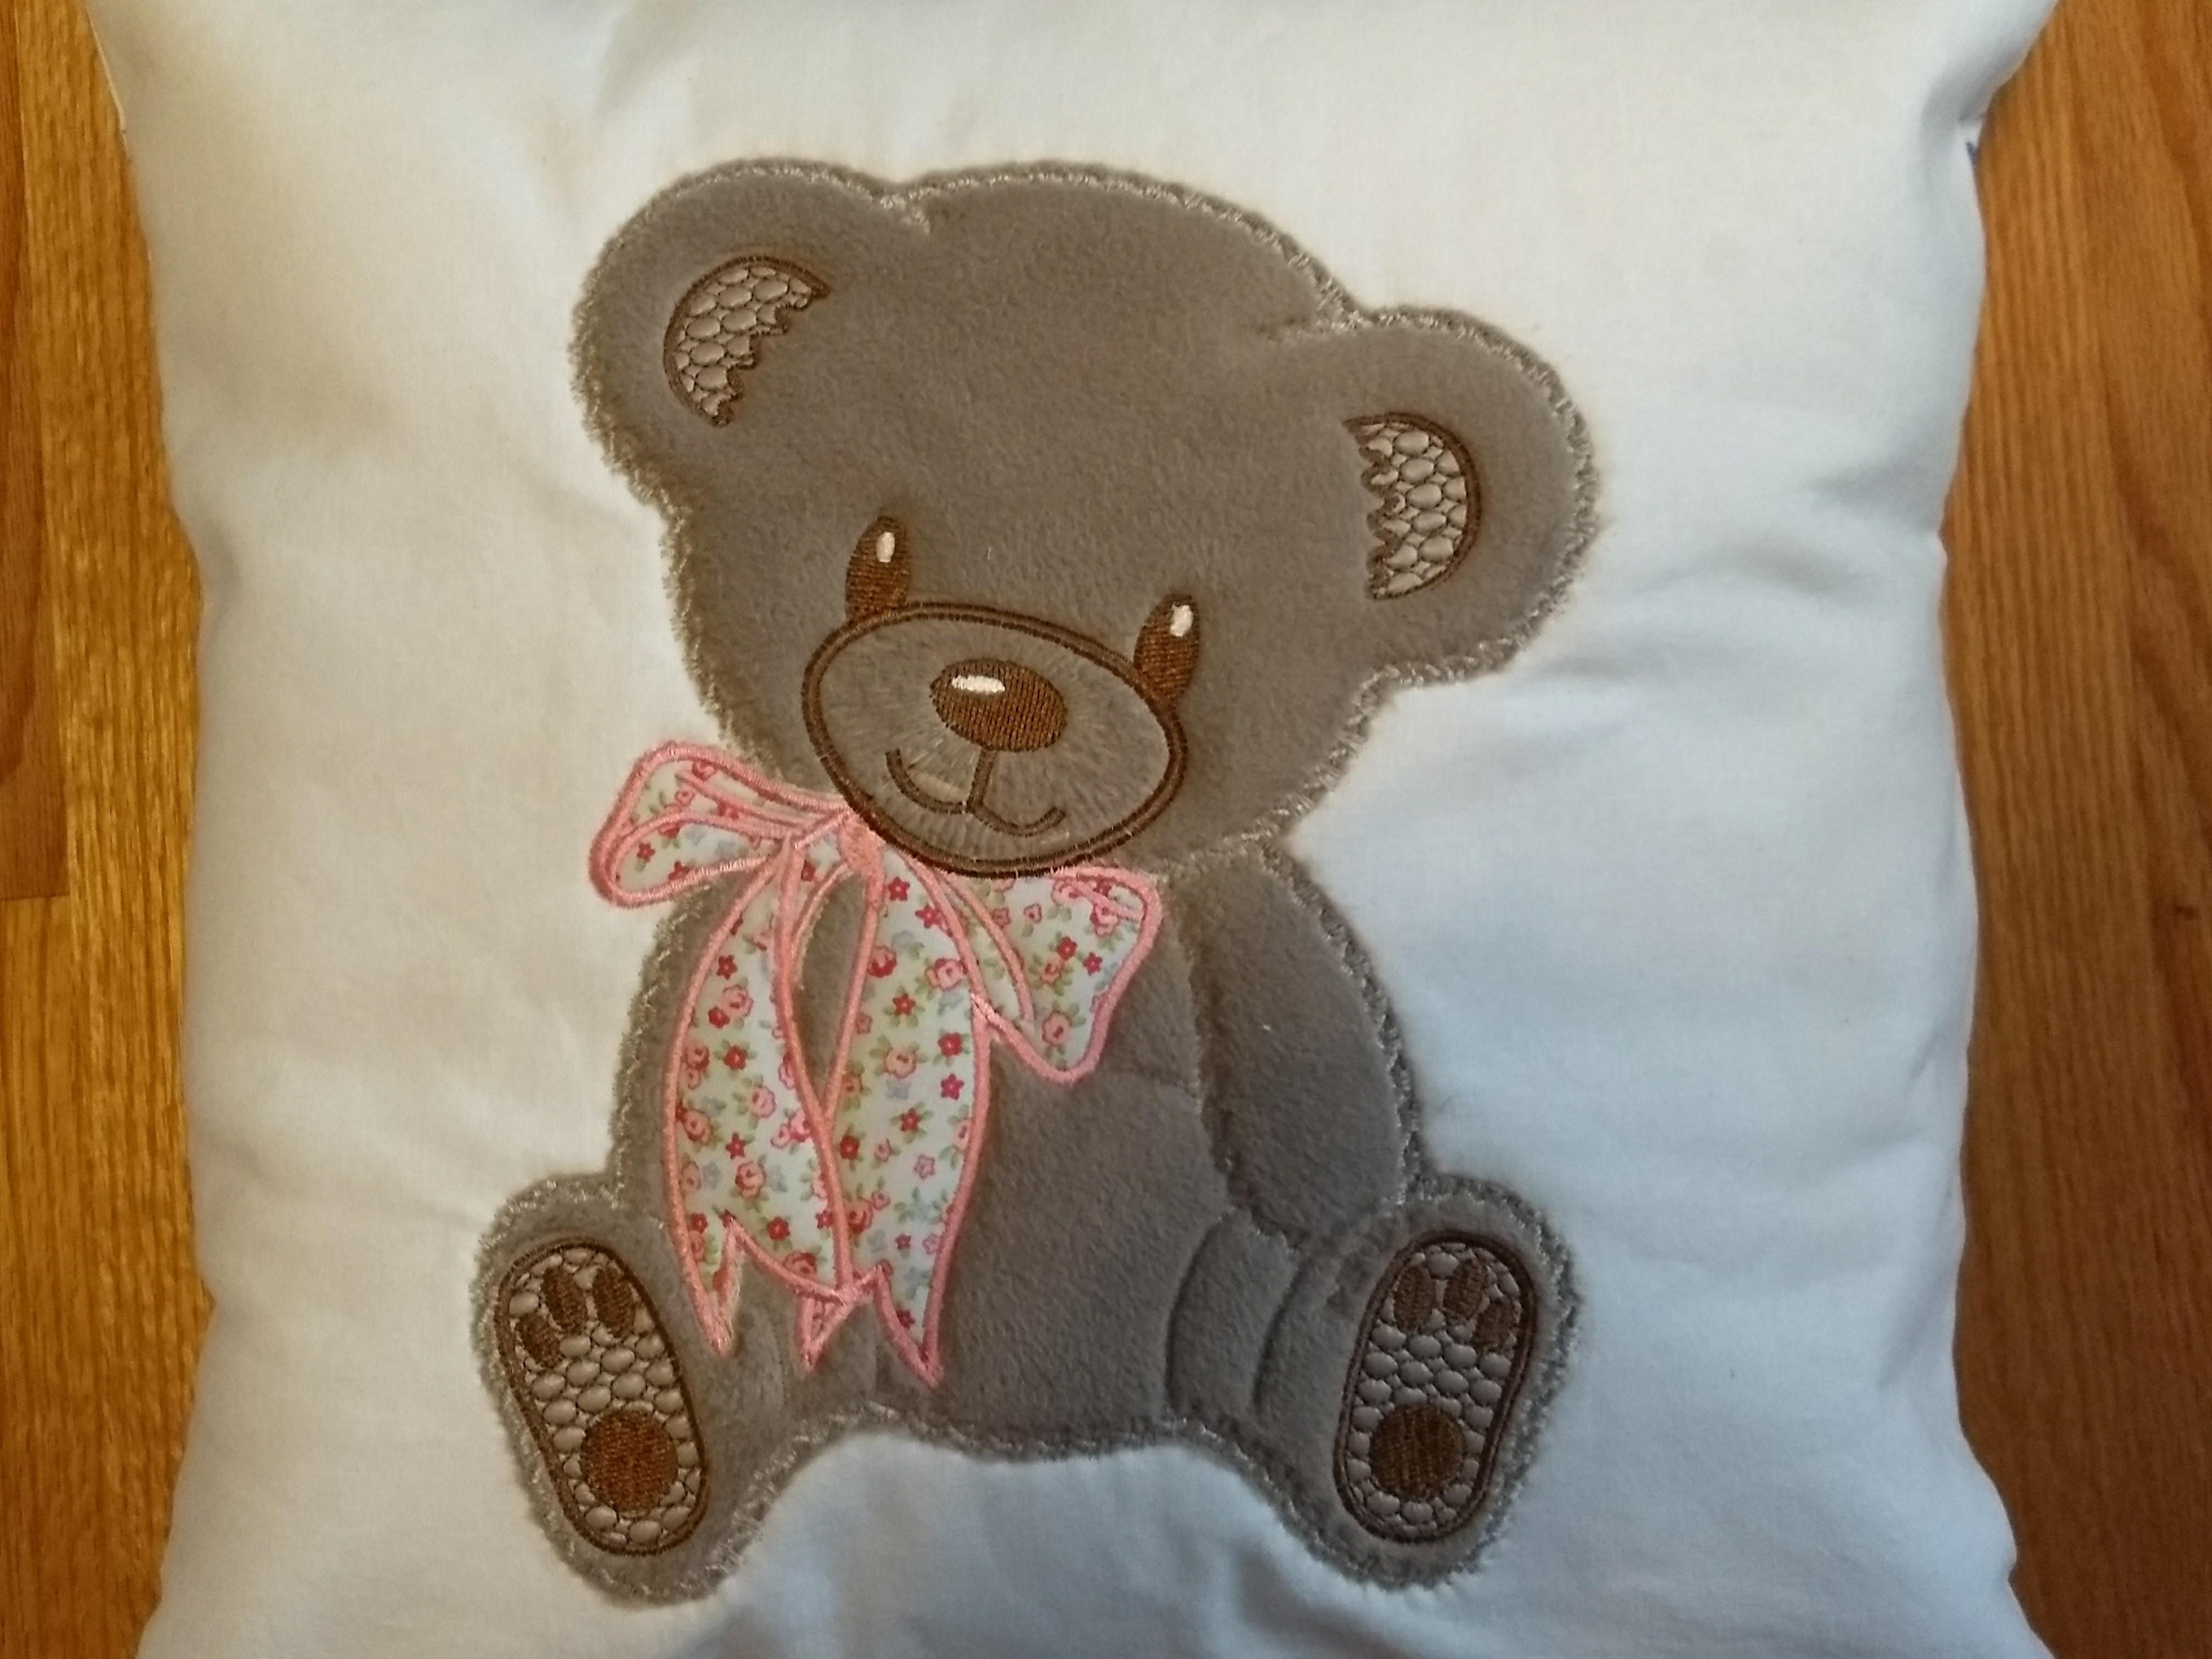 Bear Applique Free Embroidery Design Applique Machine Embroidery Community